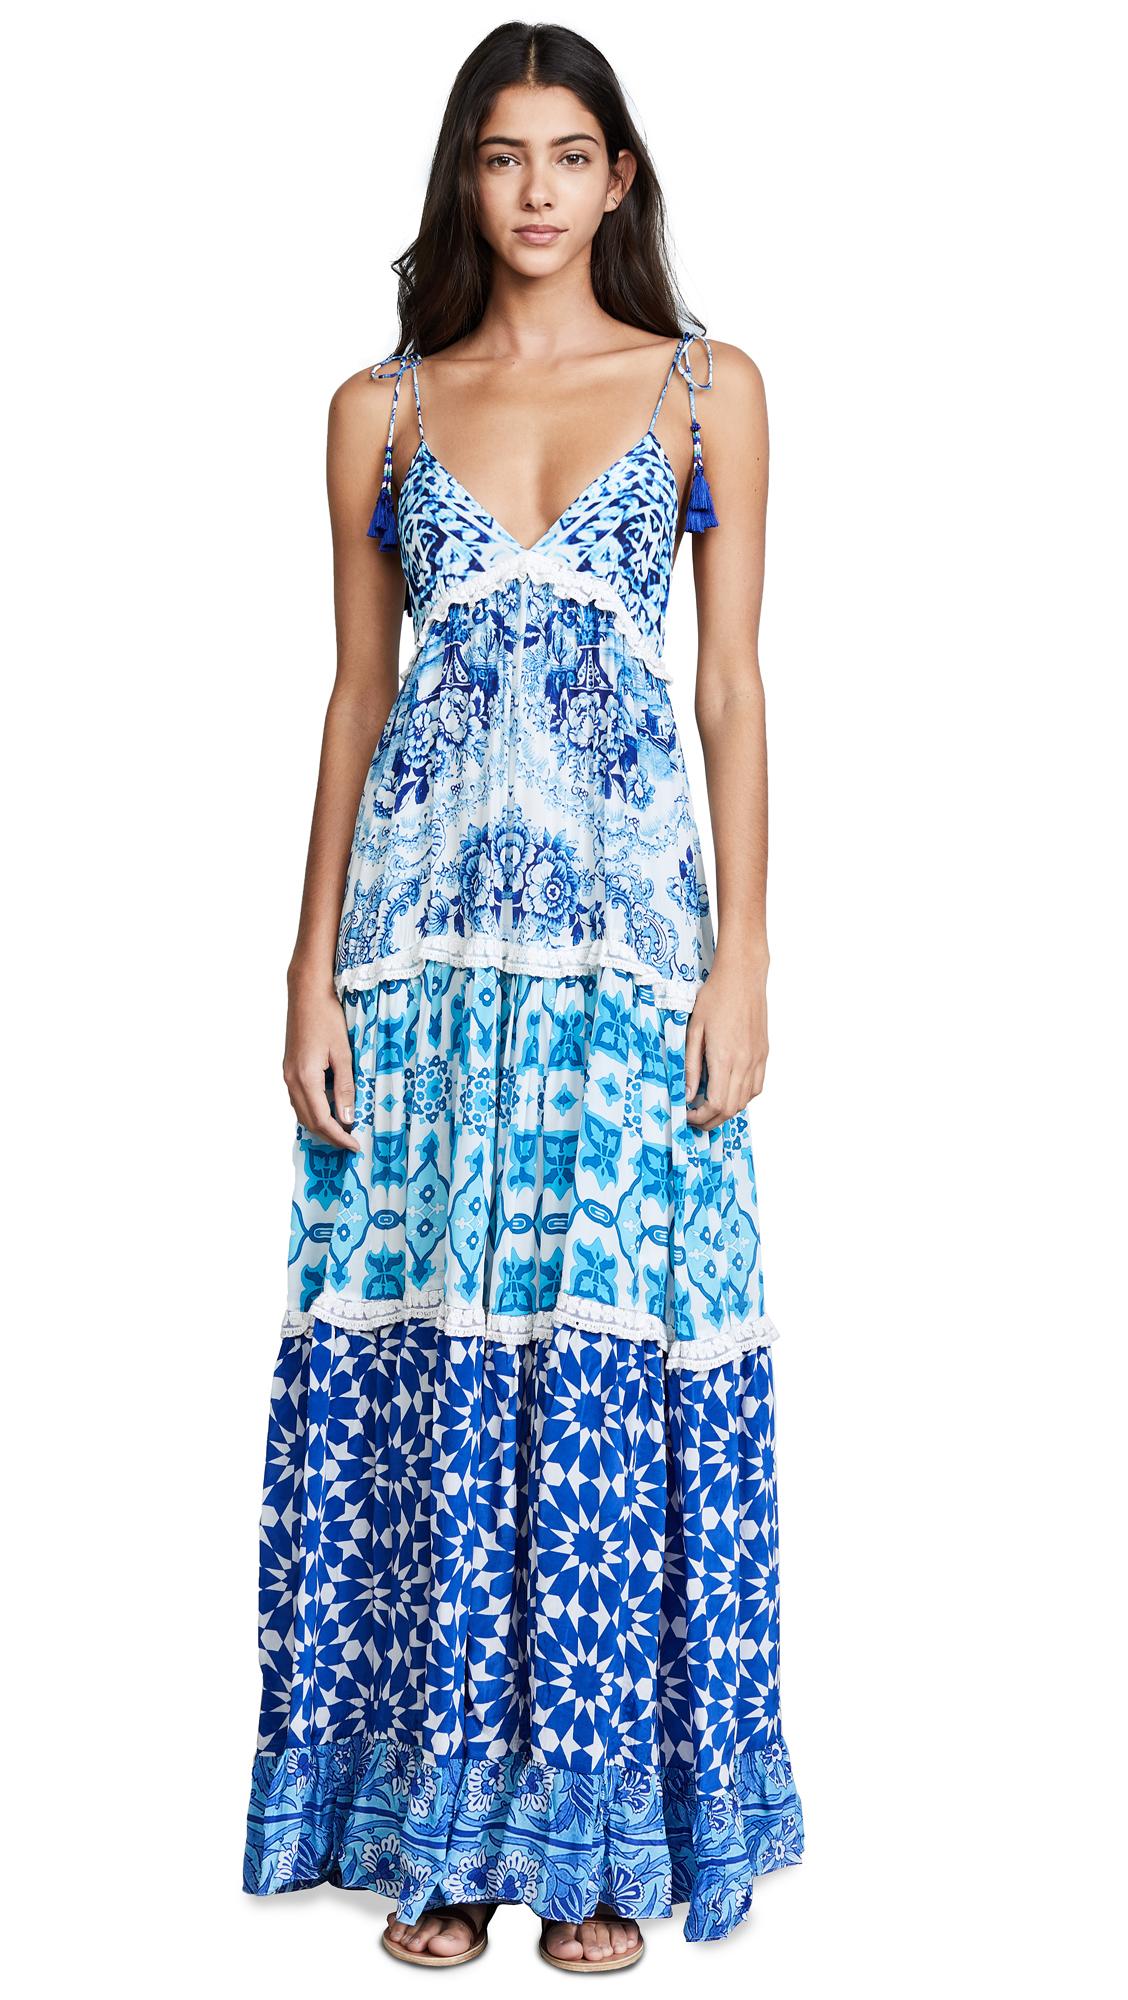 ROCOCO SAND Oriental Labyrinth Dress In Blue